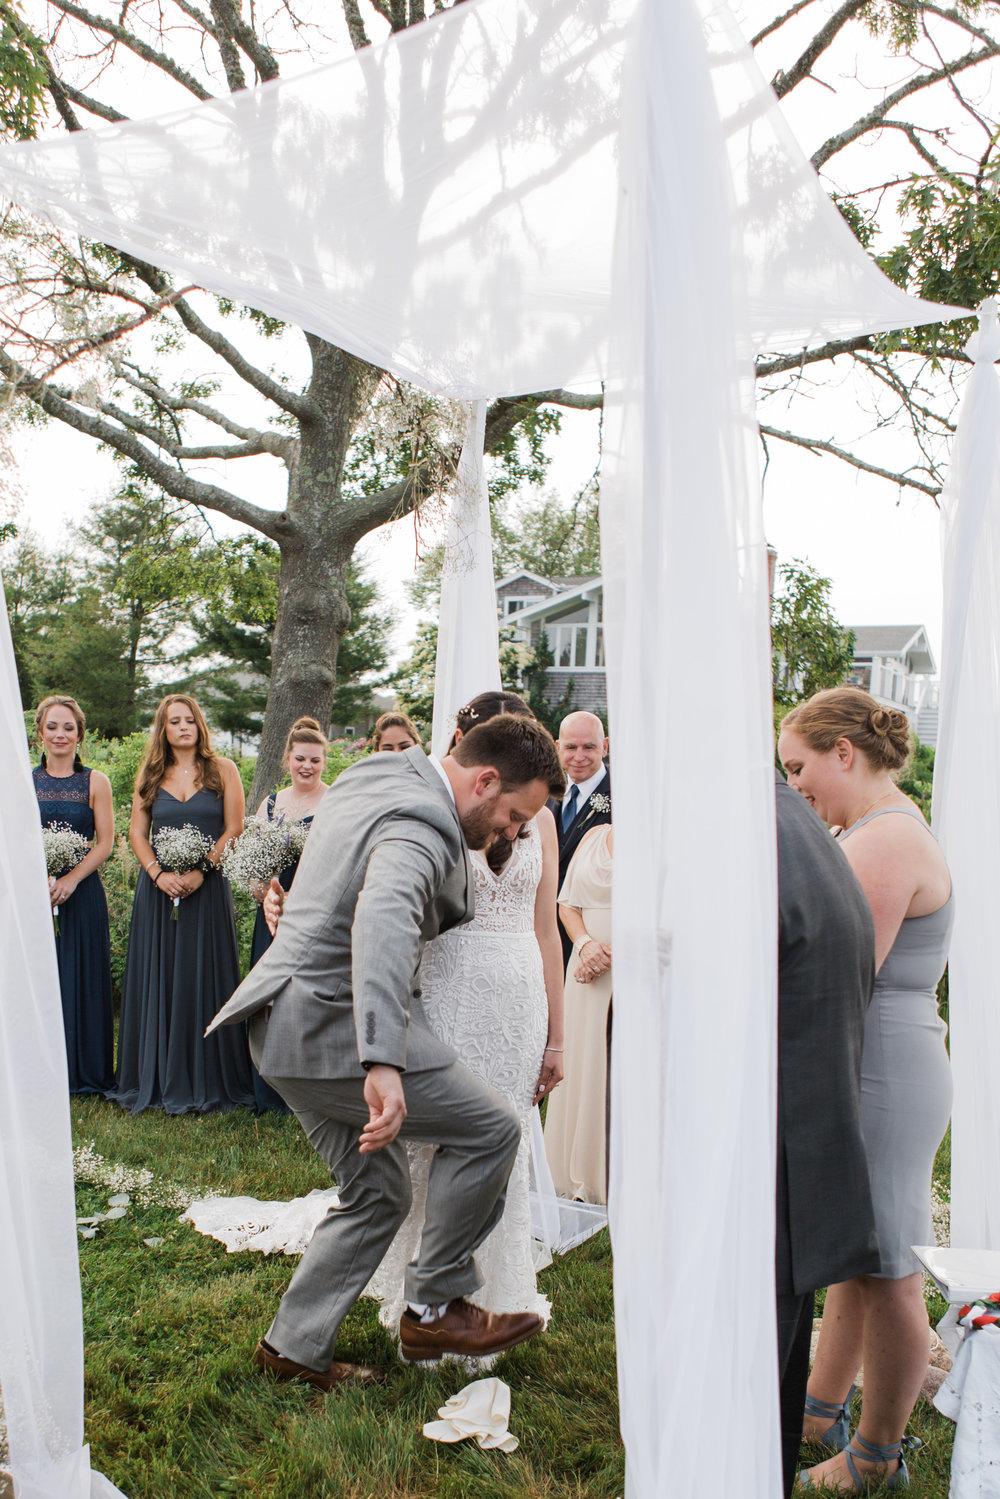 charlestown-rhode-island-wedding-photographer-breaking-of-the-glass